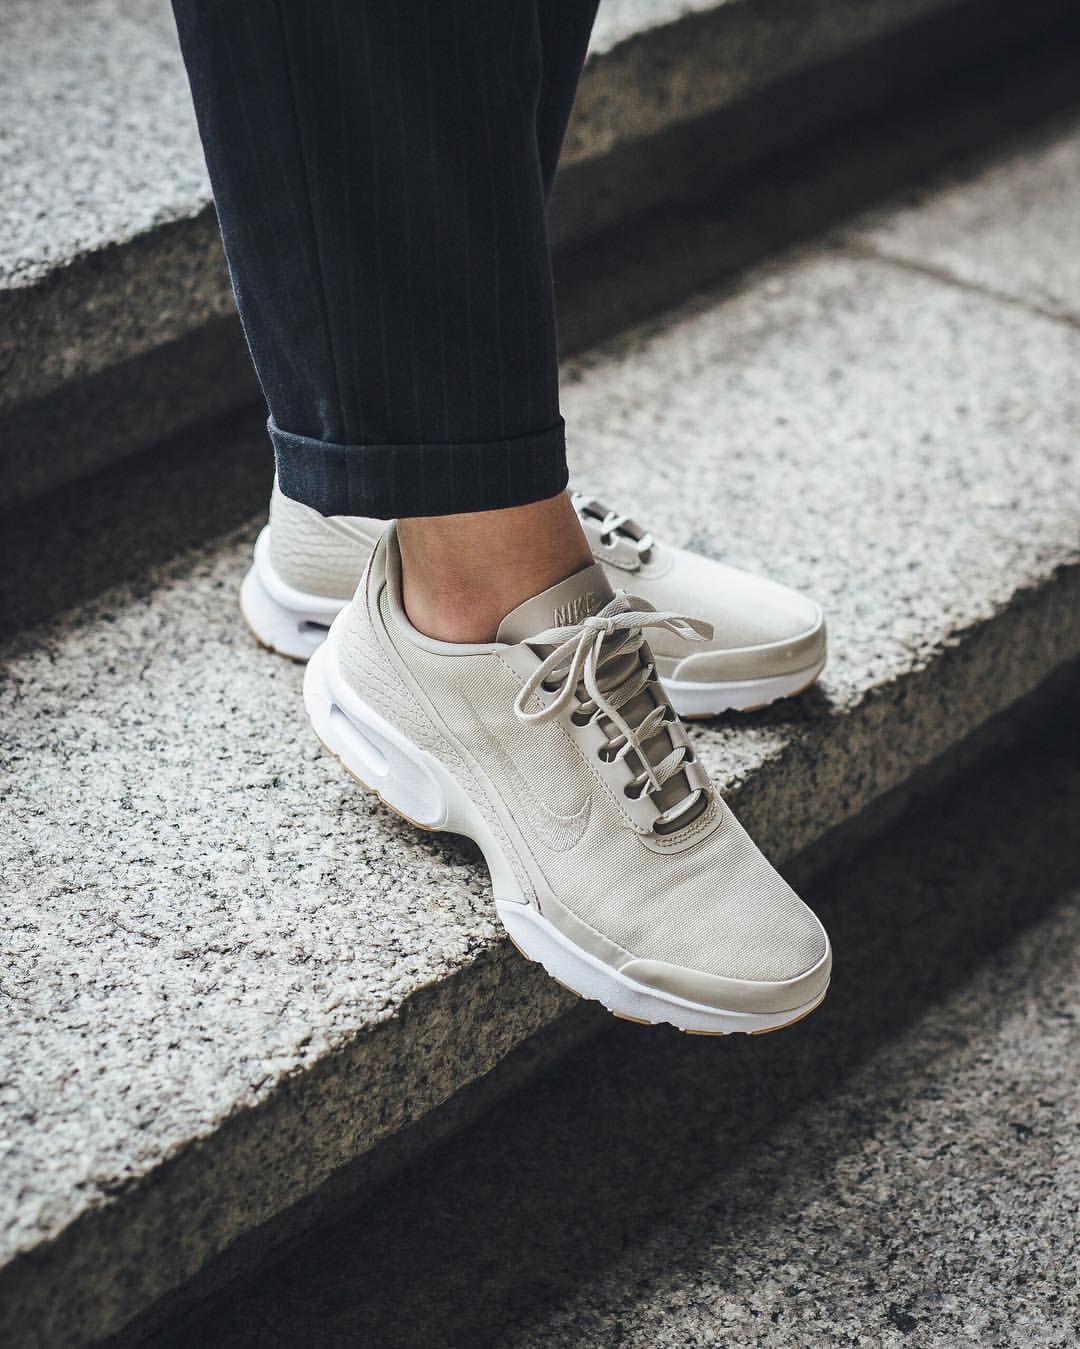 pretty nice nice cheap best online Women Shoes in 2020   Sneaker boutique, Sneakers, Fashion